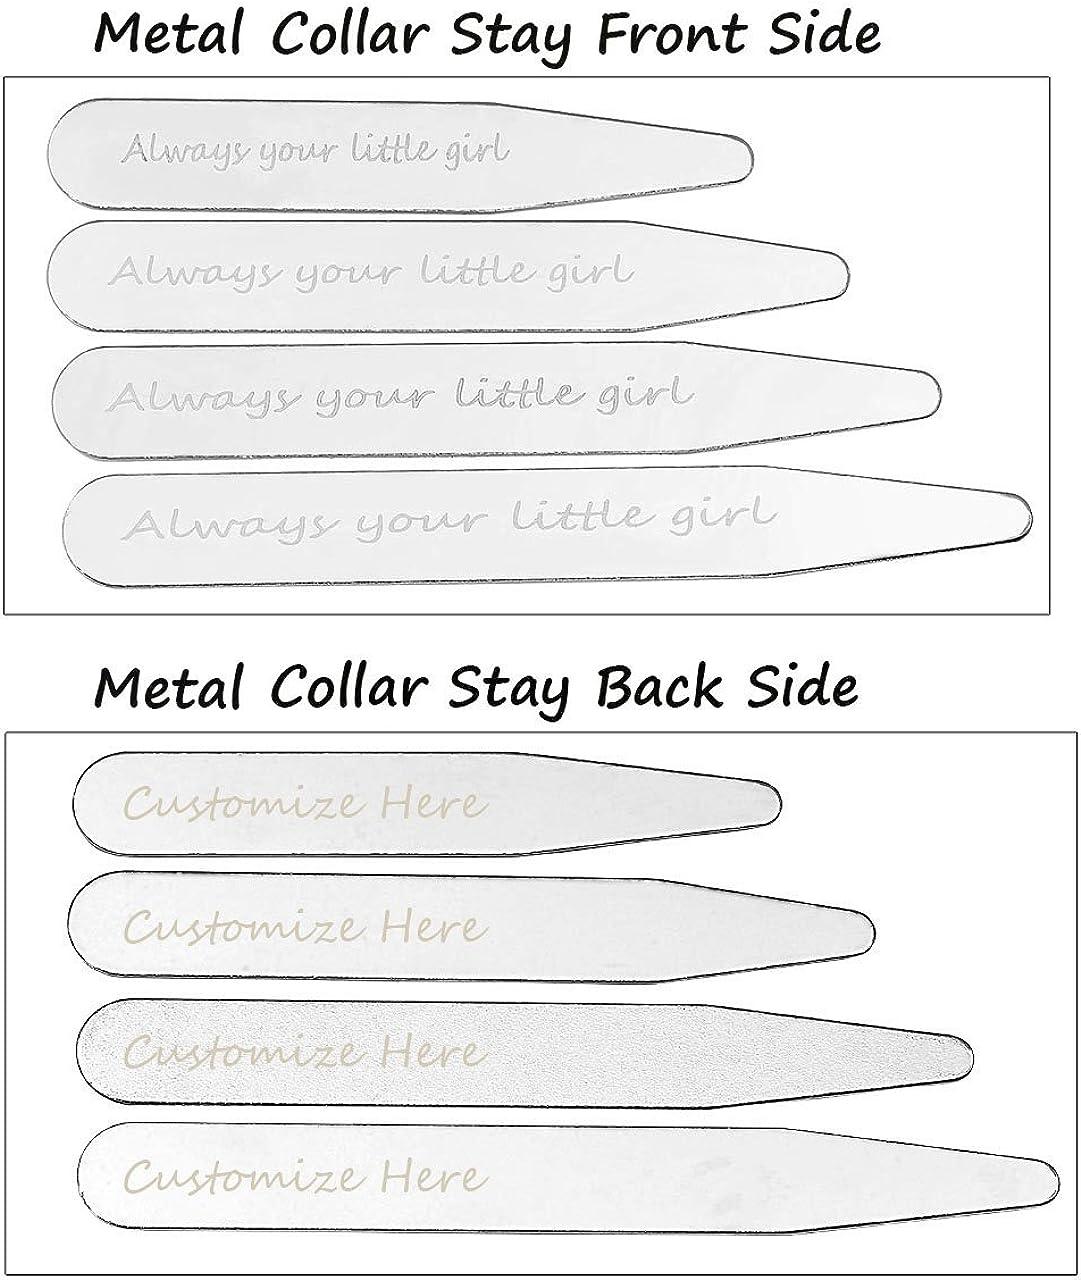 Zysta 4 Pairs Set Stainless Steel Shirts Collar Stand Bones 2.2